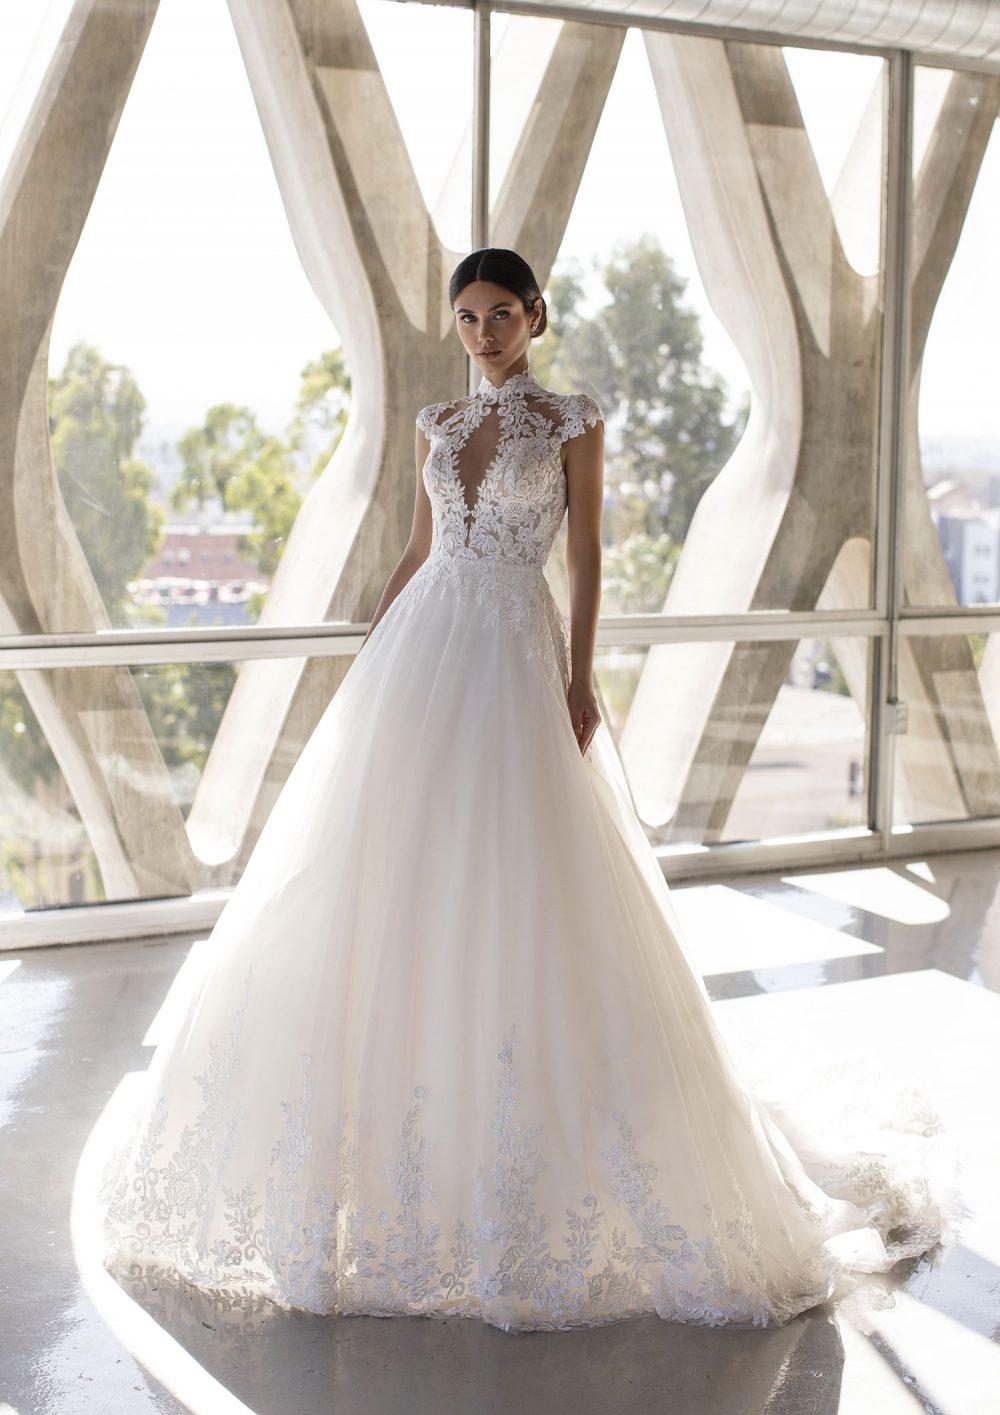 Mariages: abito da sposa Pronovias 2021 a Vicenza, Verona, Padova, Veneto BLYTH